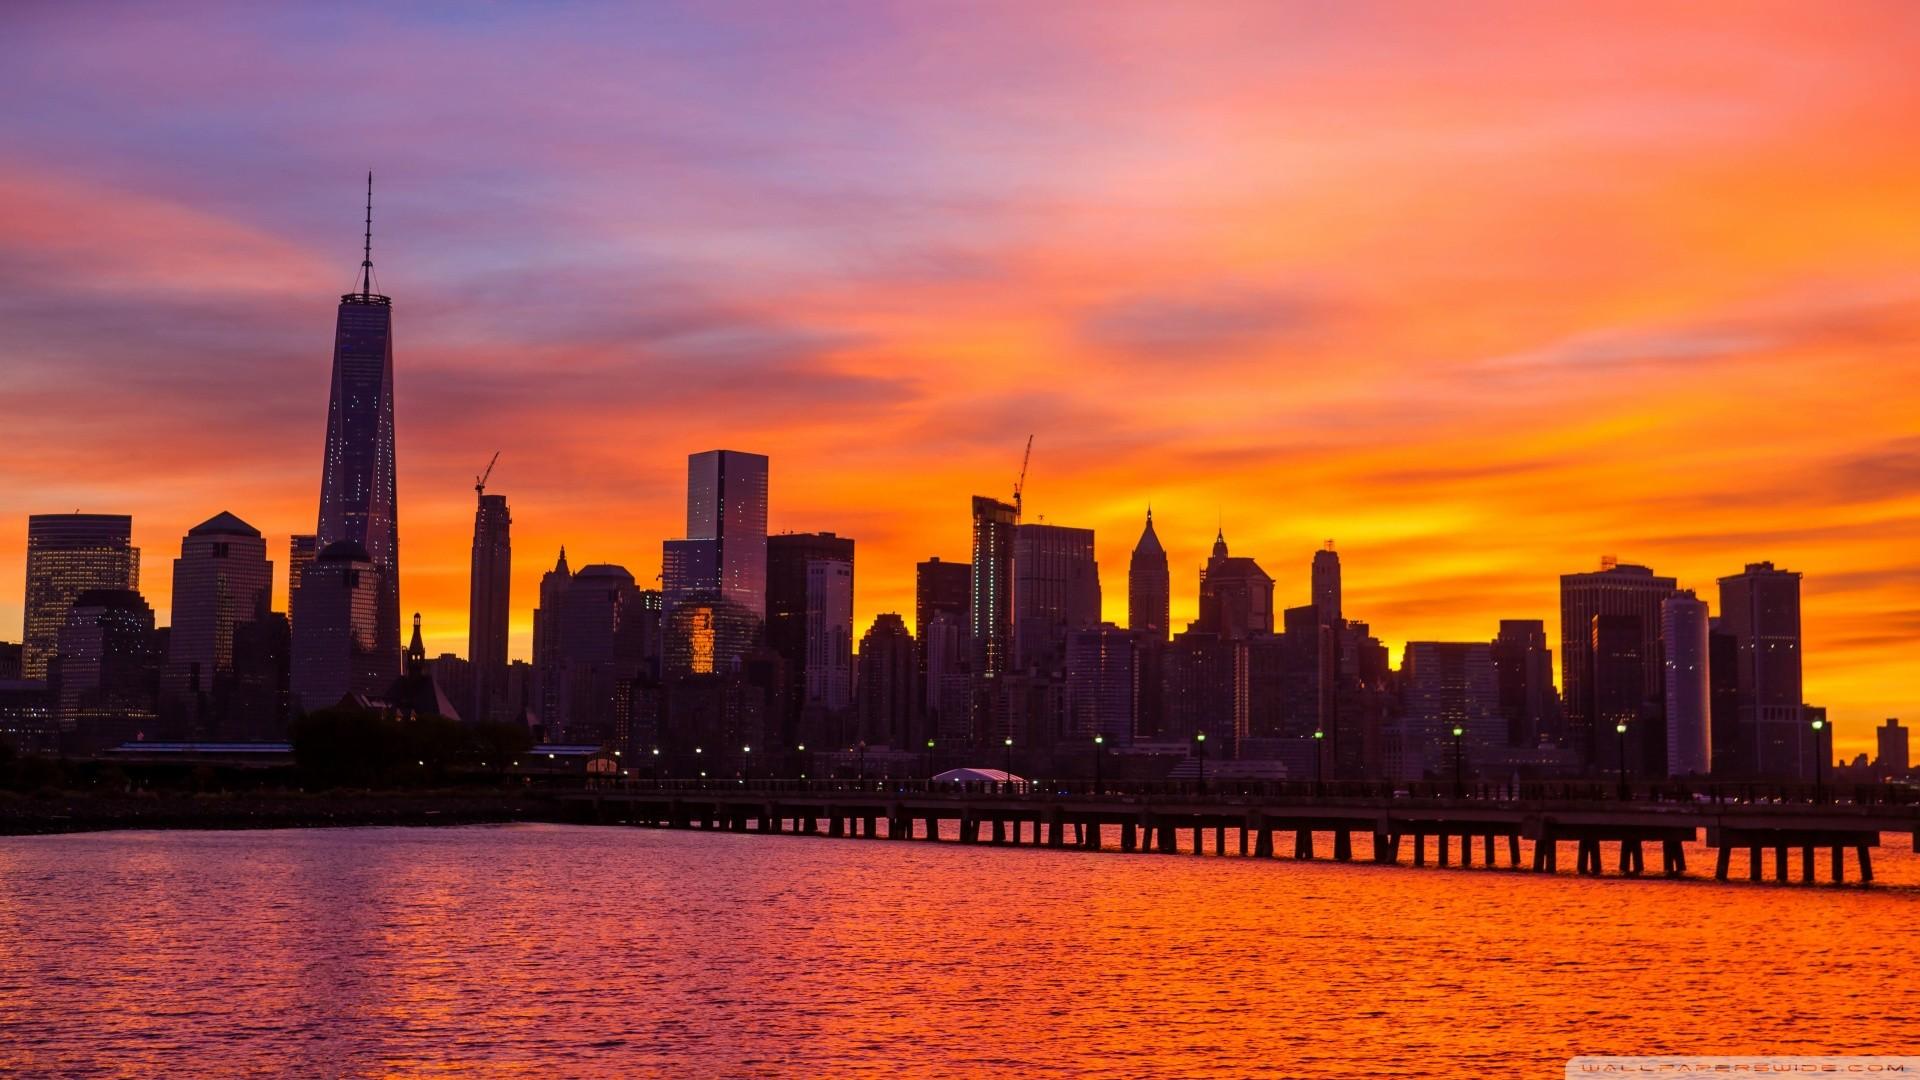 new york skyline wallpaper ·① wallpapertag